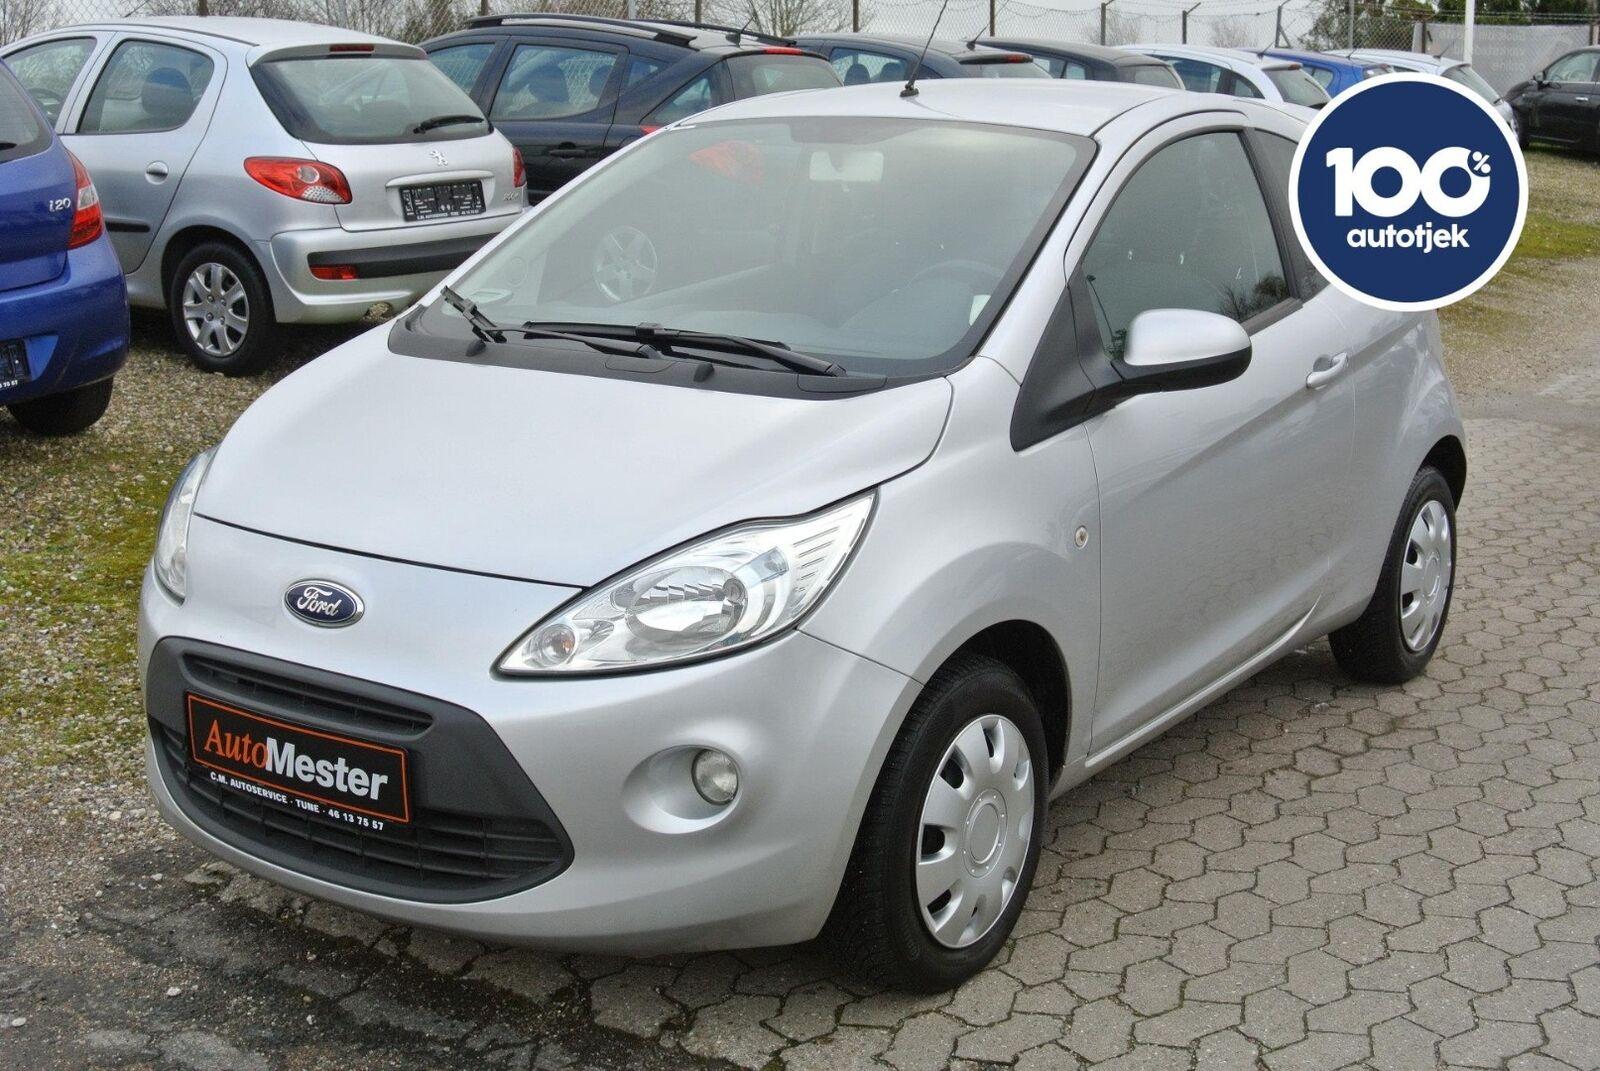 Ford Ka 1,2 Titanium 3d - 49.900 kr.